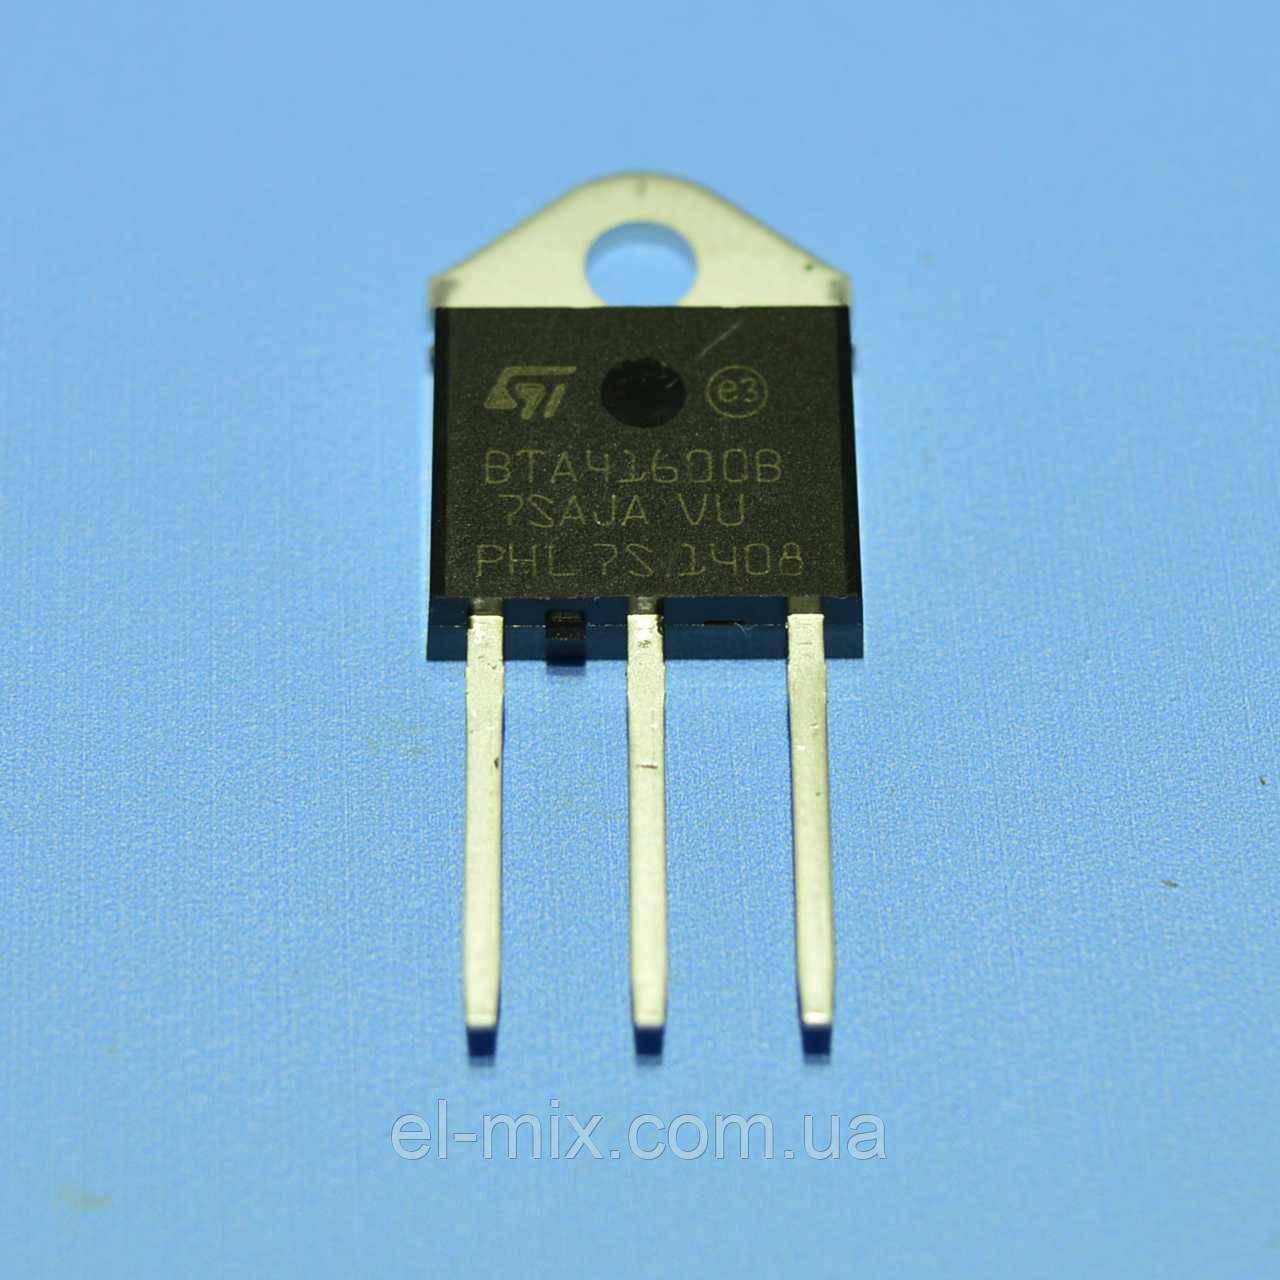 Симистор BTA41-600B  TO-220  STM/China